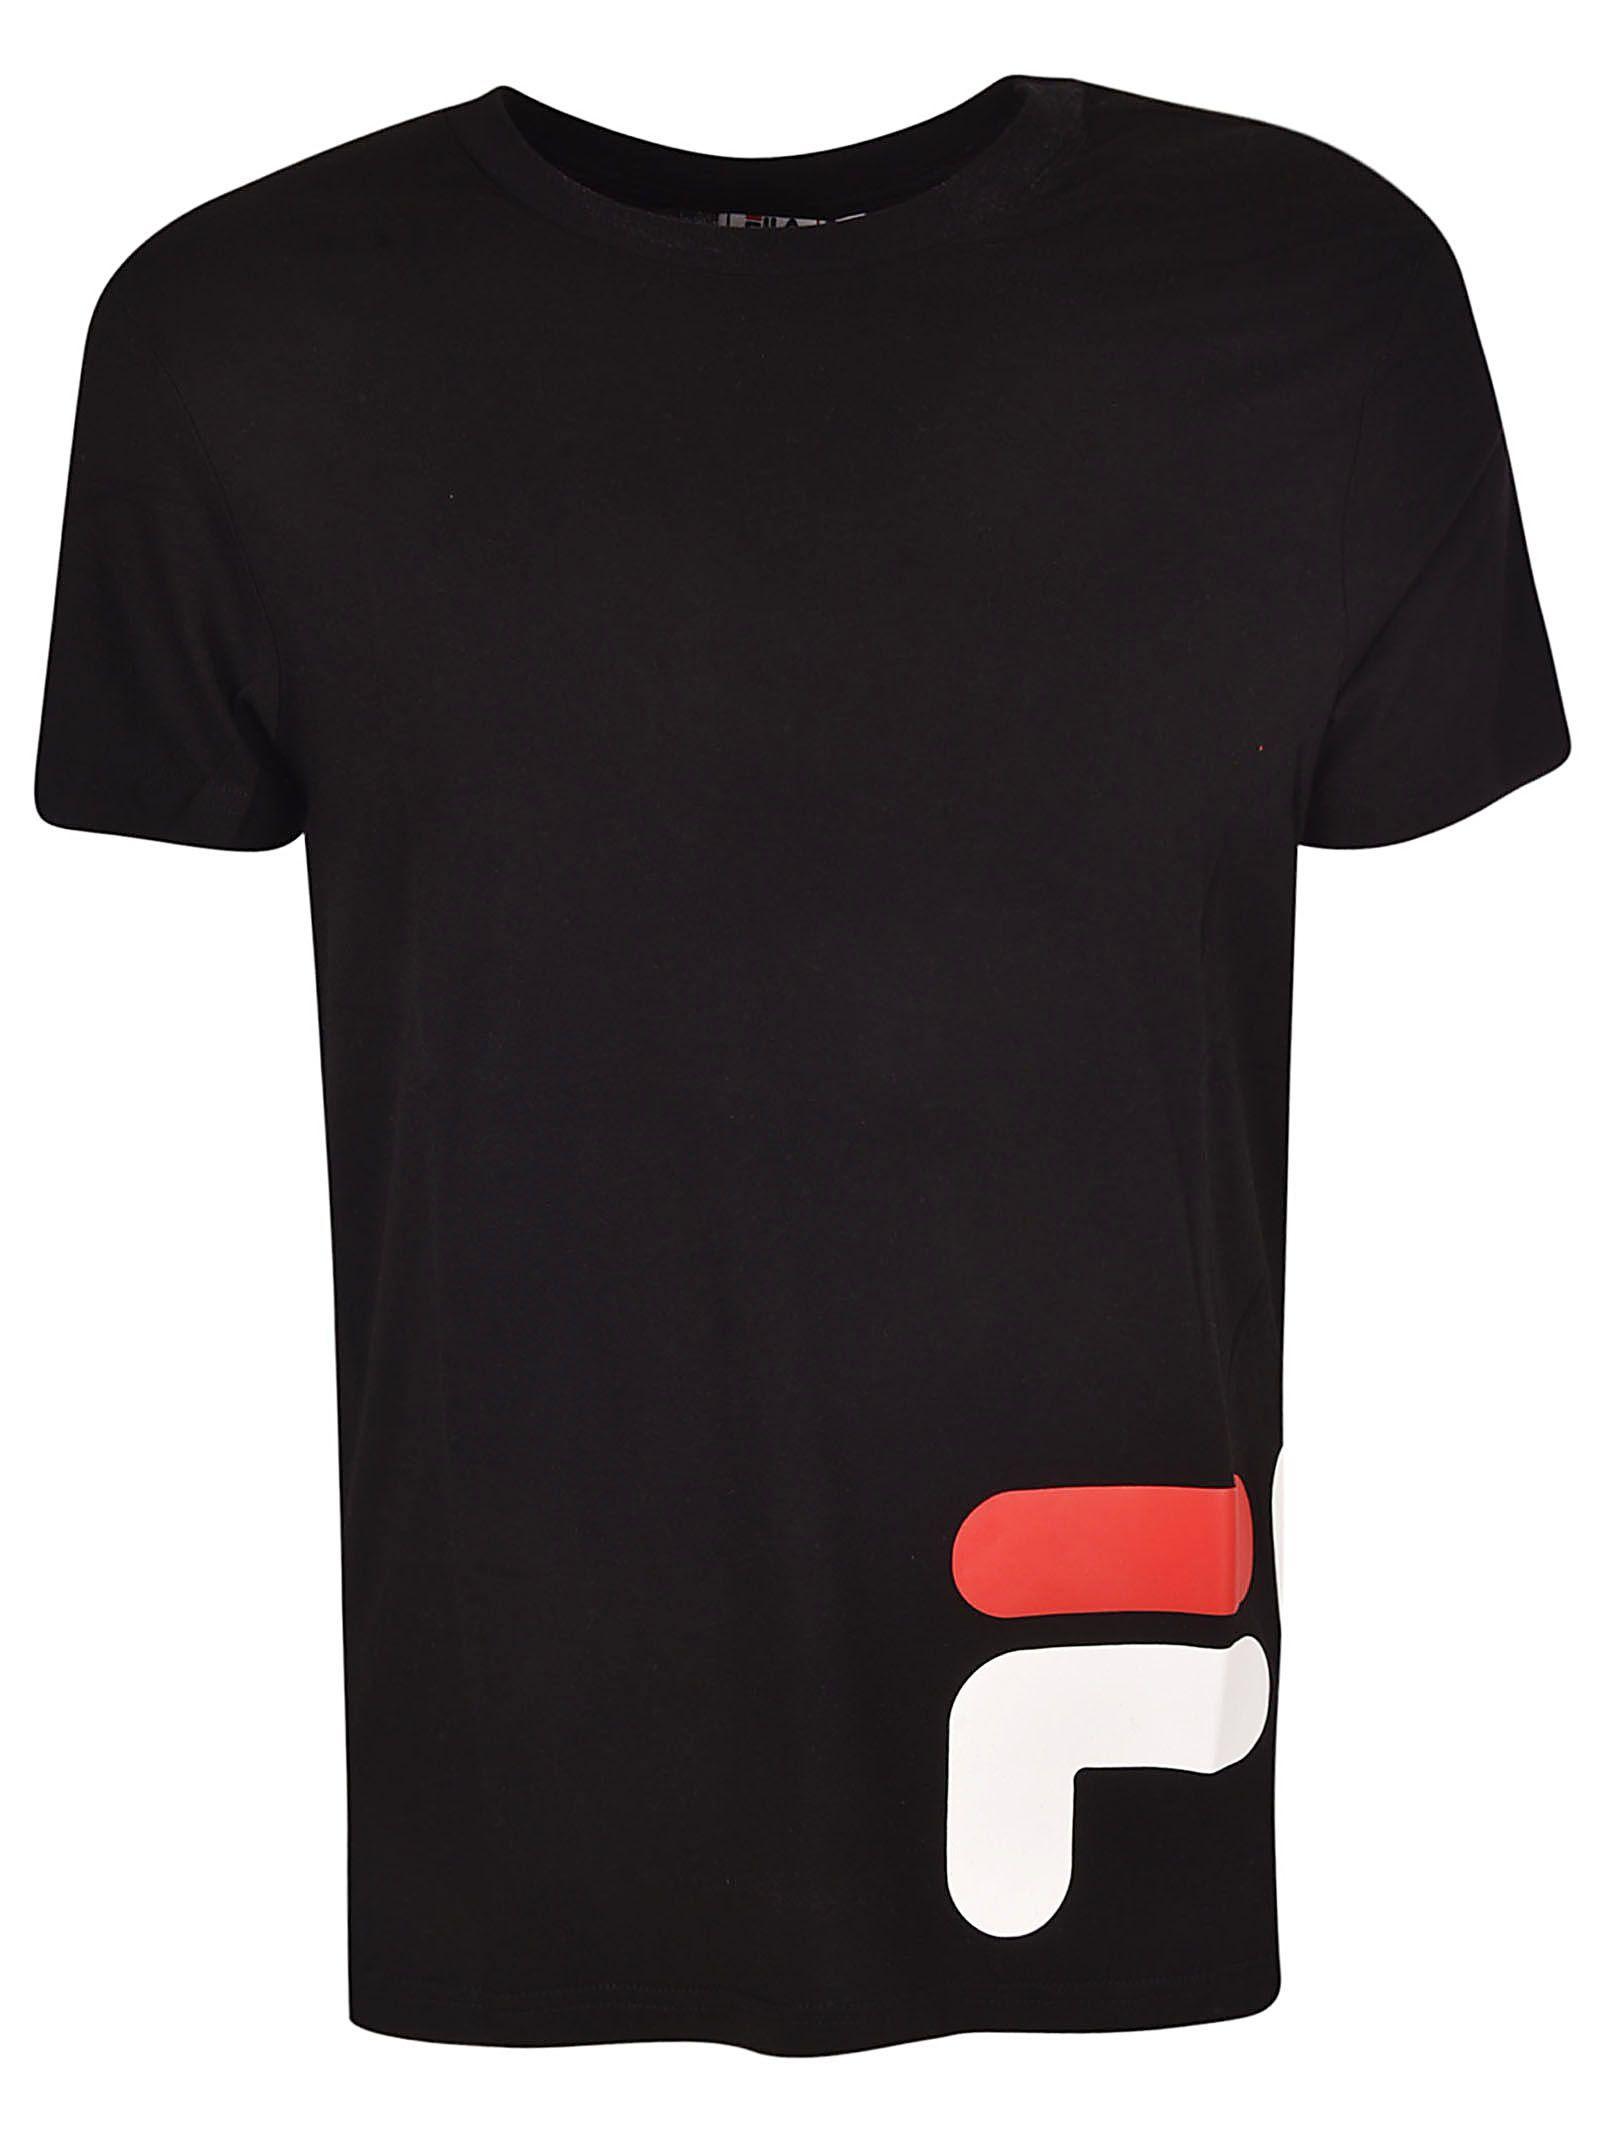 640a6860470 FILA SIDE LOGO T-SHIRT.  fila  cloth